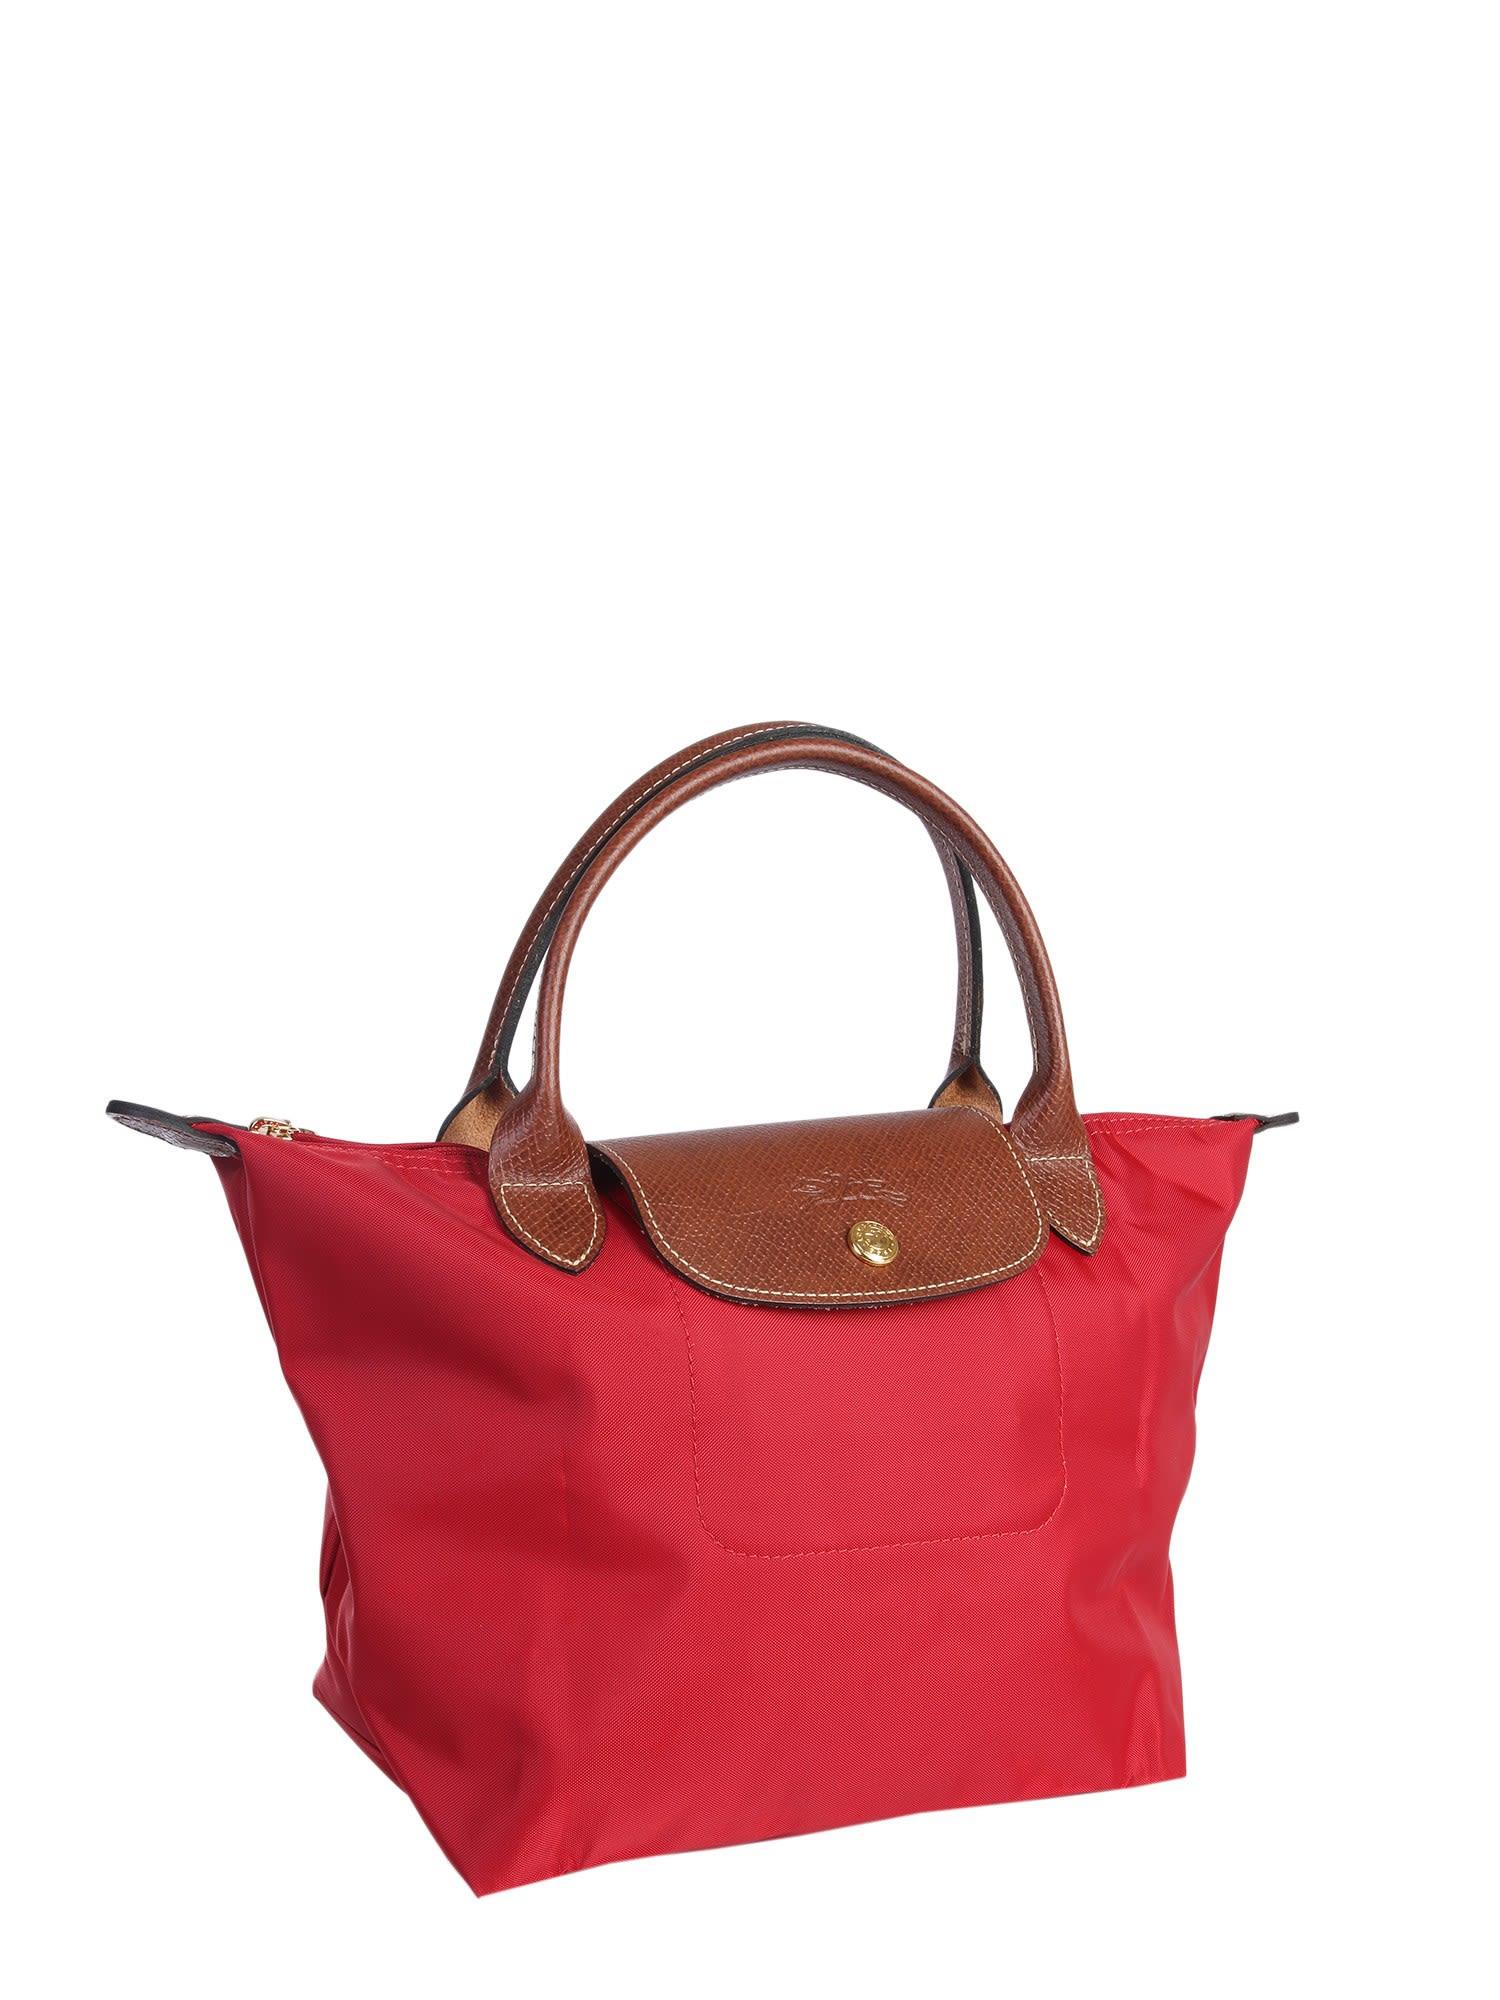 f36489ca10688 Small Le 10783654Italist Longchamp Bag Rosso Pliage v8nNmO0w